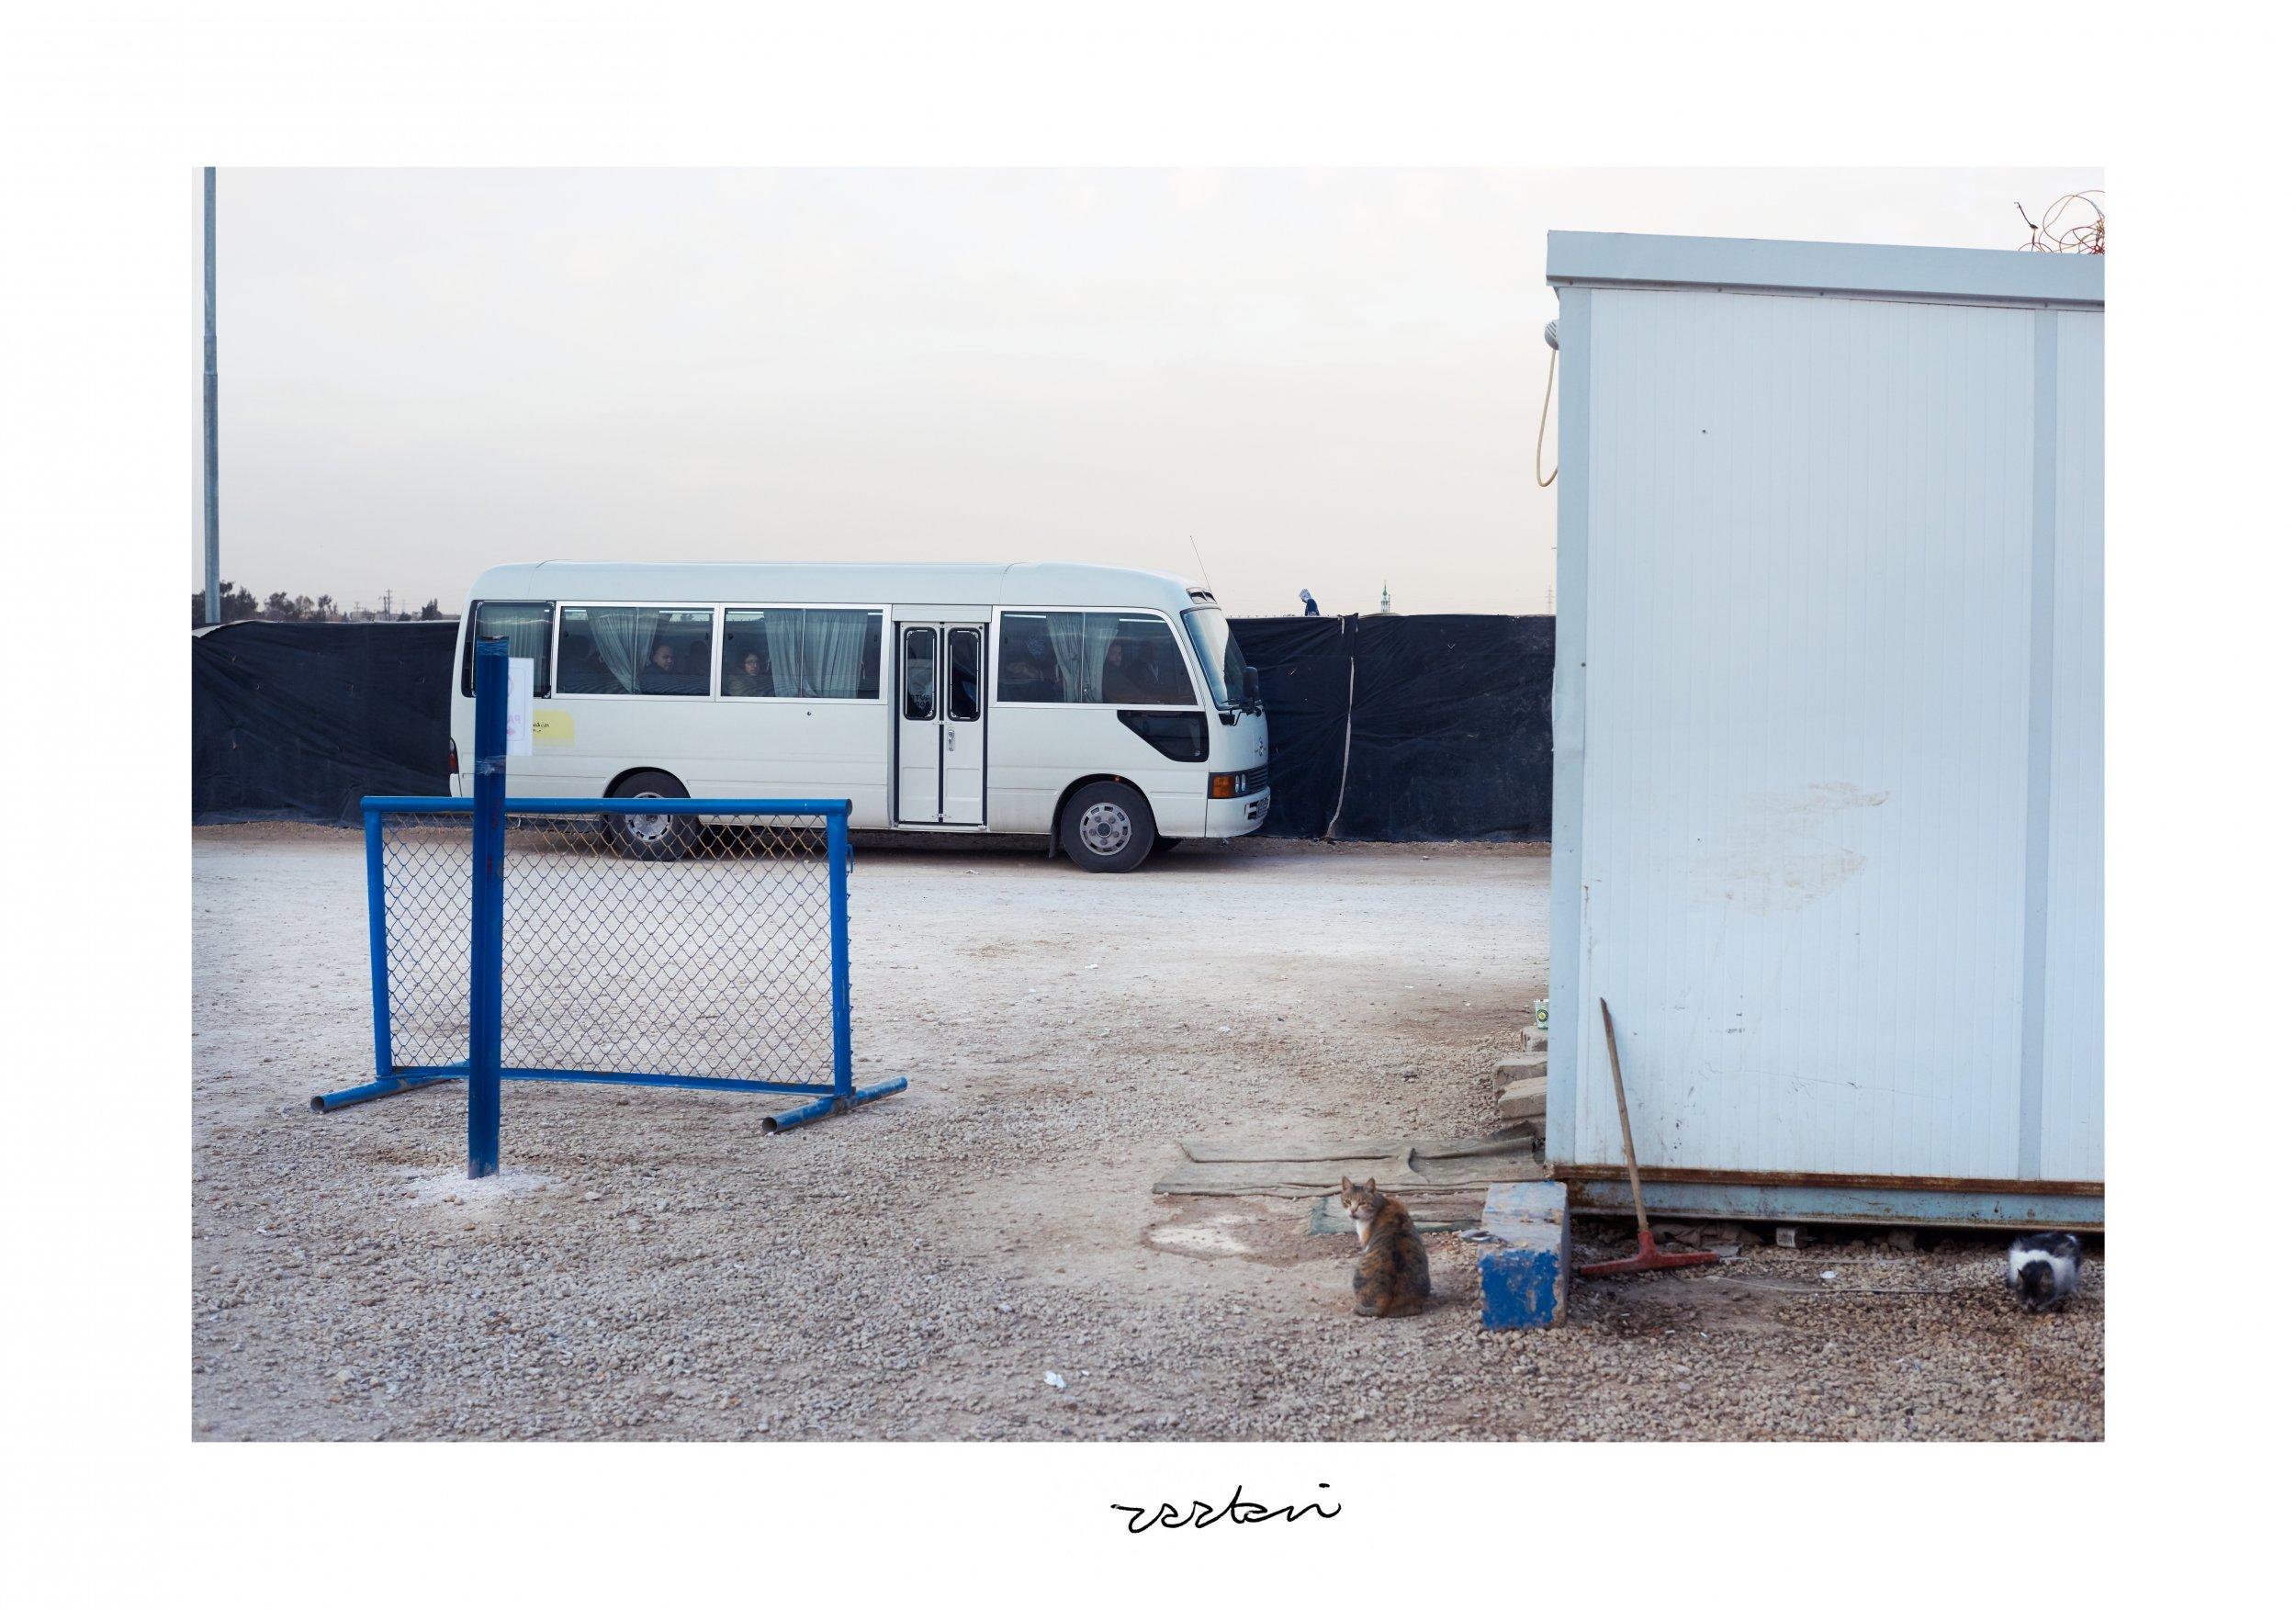 03_17_Syria_01